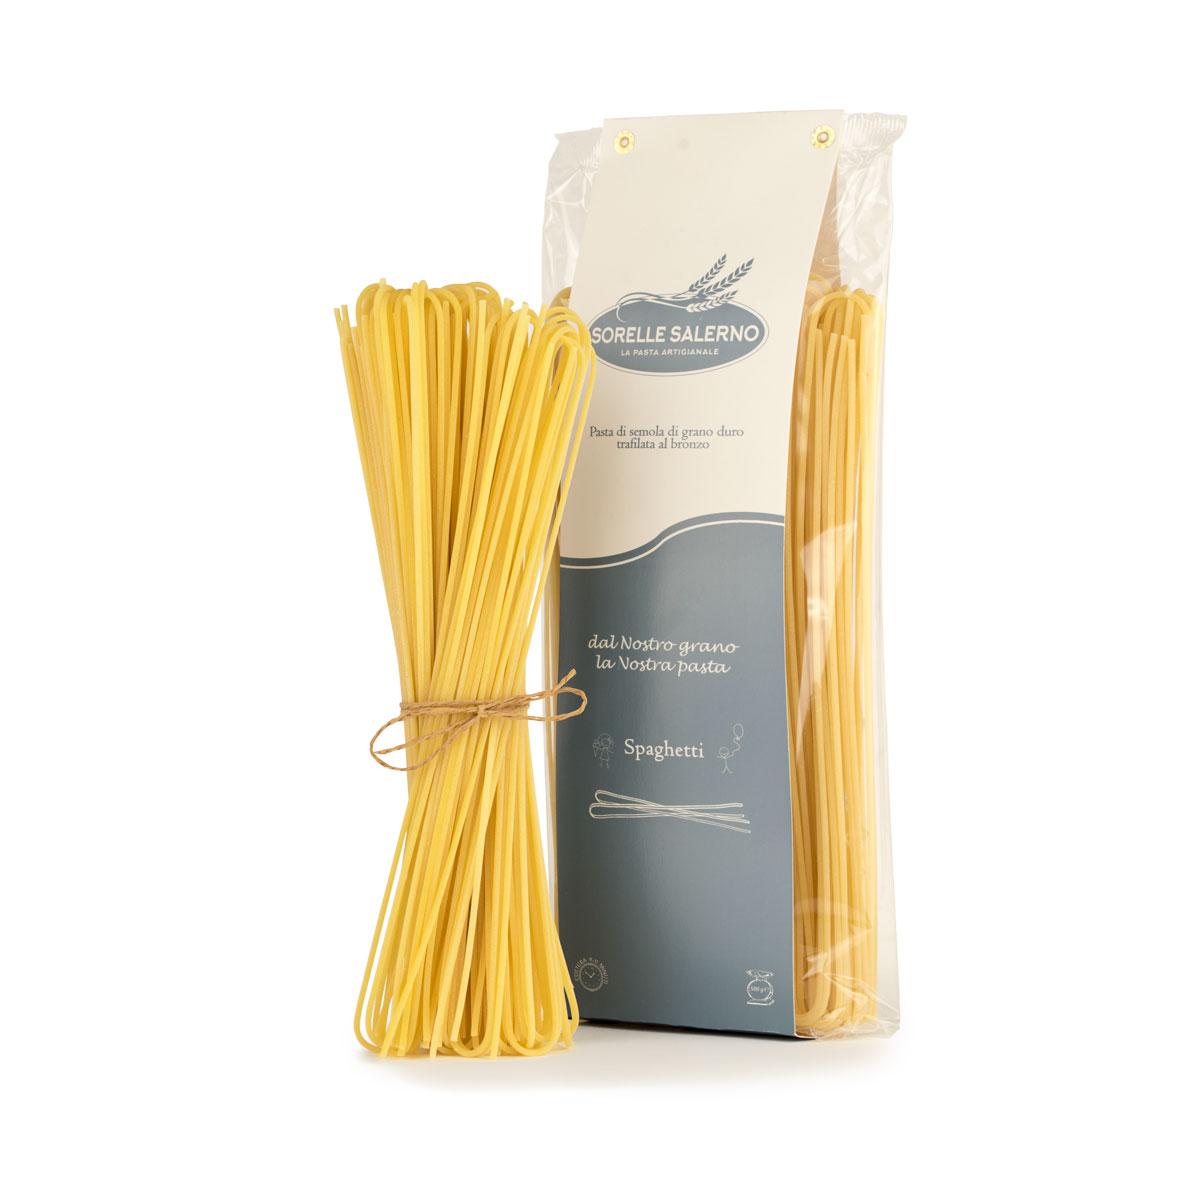 pasta-100-italiana-sorelle-salerno